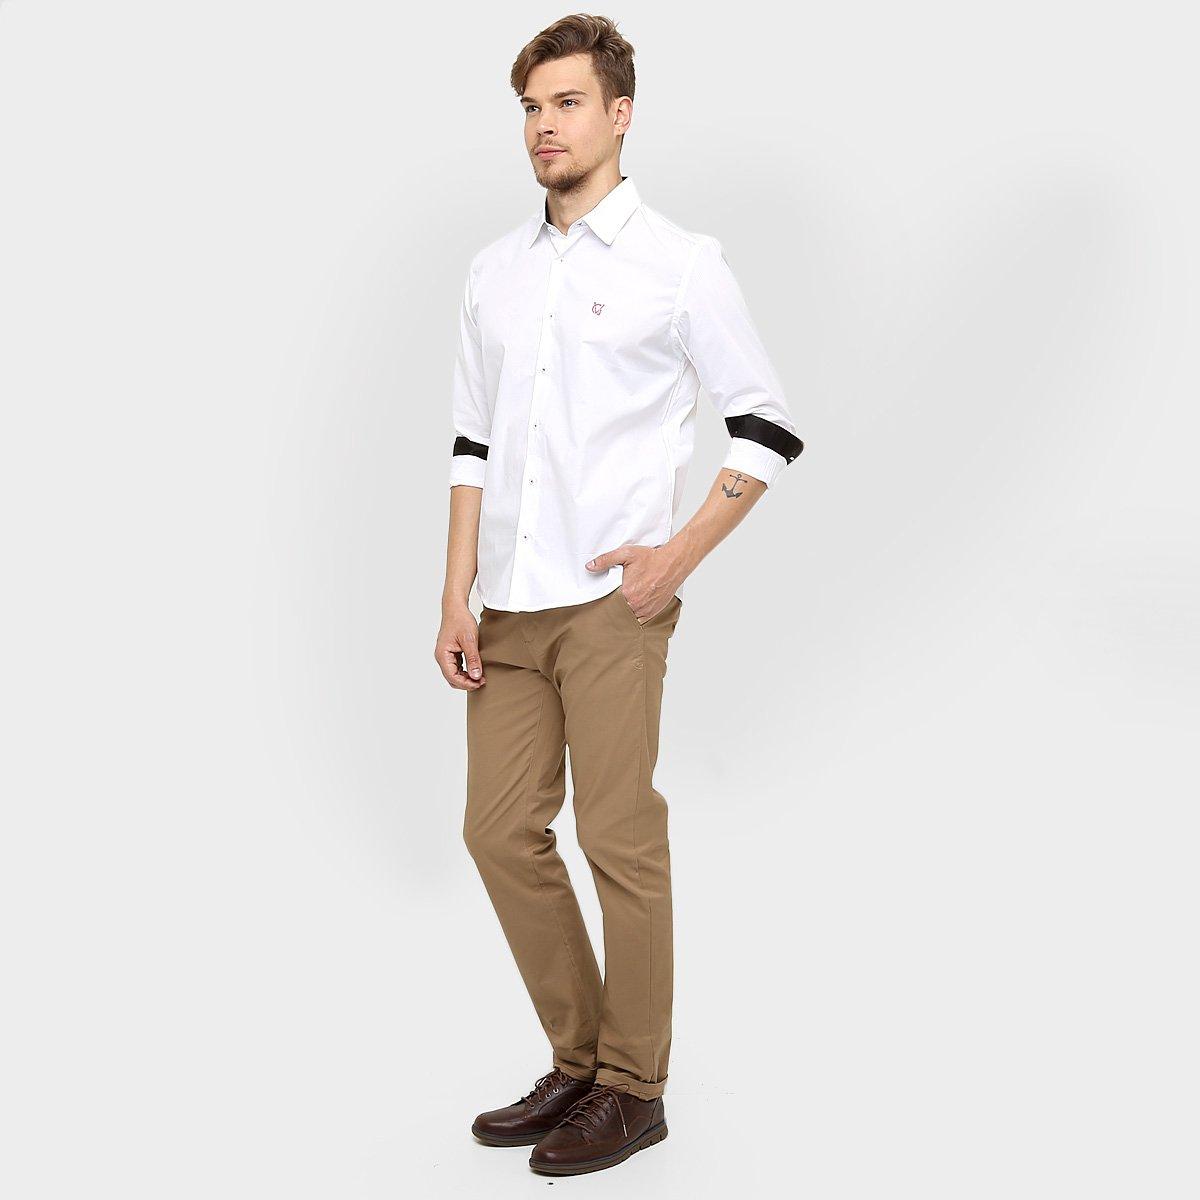 61068cad00 Camisa Social Vasco Palla D Oro Manga Longa Masculina - Compre Agora ...